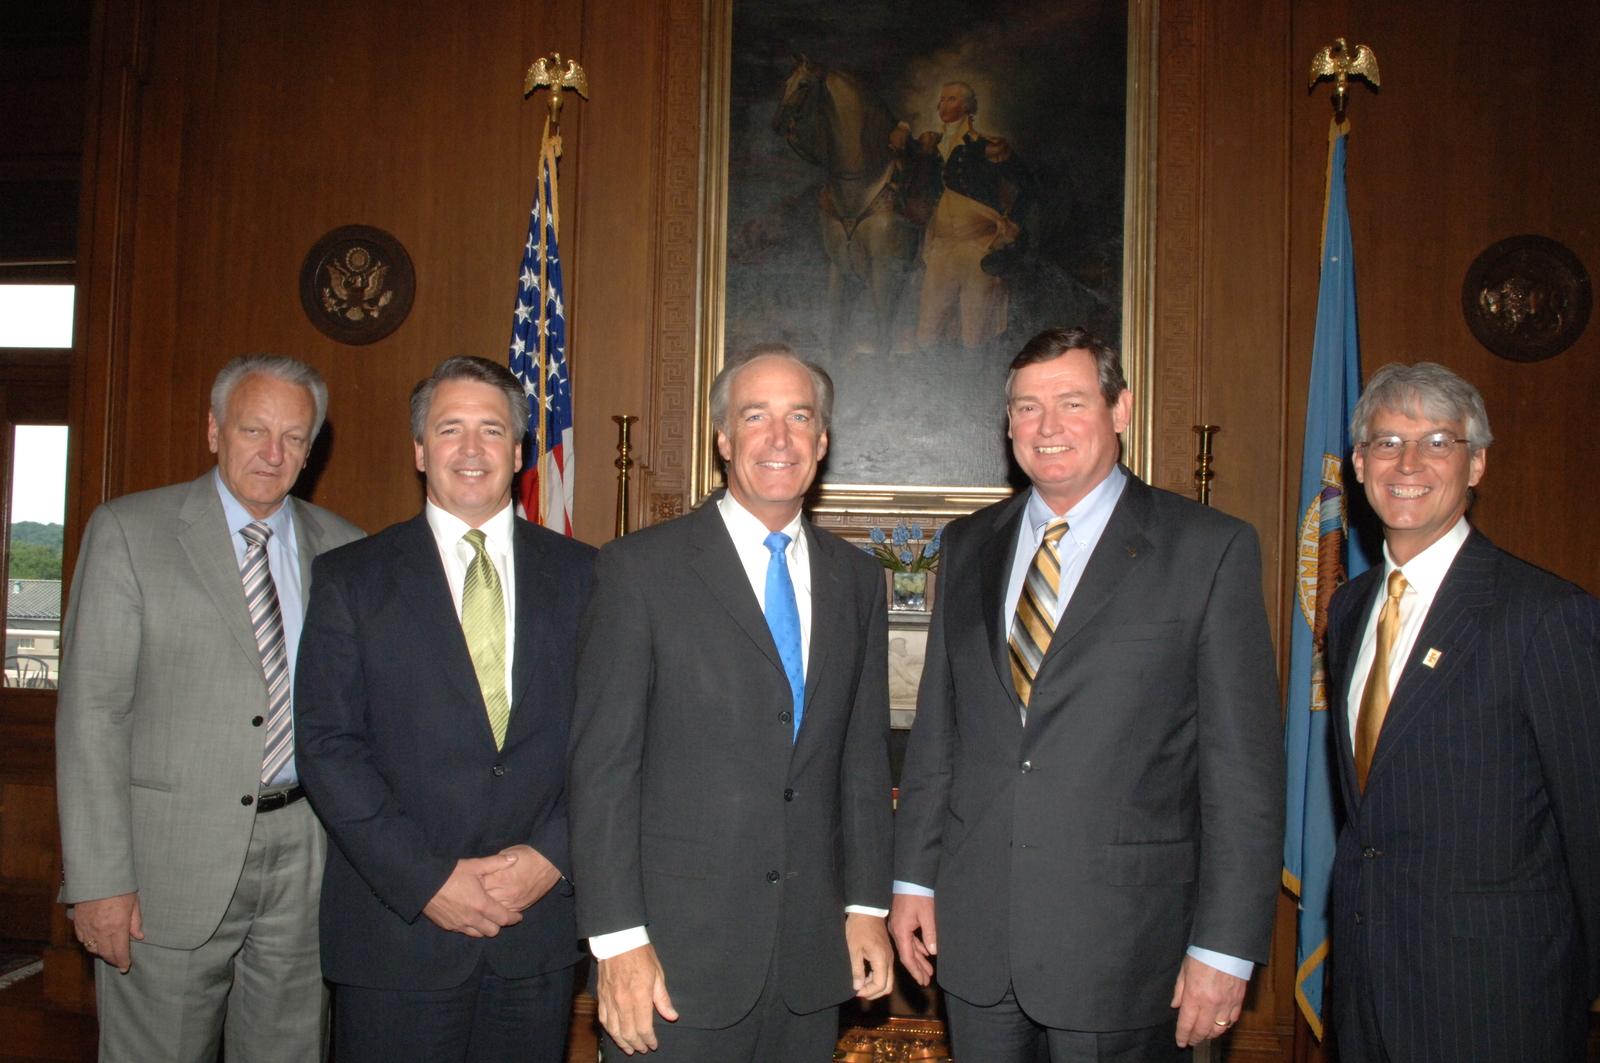 [Assignment: 48-DPA-06-22-07_SOI_K_White] Secretary Dirk Kempthorne [and aides meeting at Main Interior] with Timothy White, President of the University of Idaho [48-DPA-06-22-07_SOI_K_White_DOI_4577.JPG]